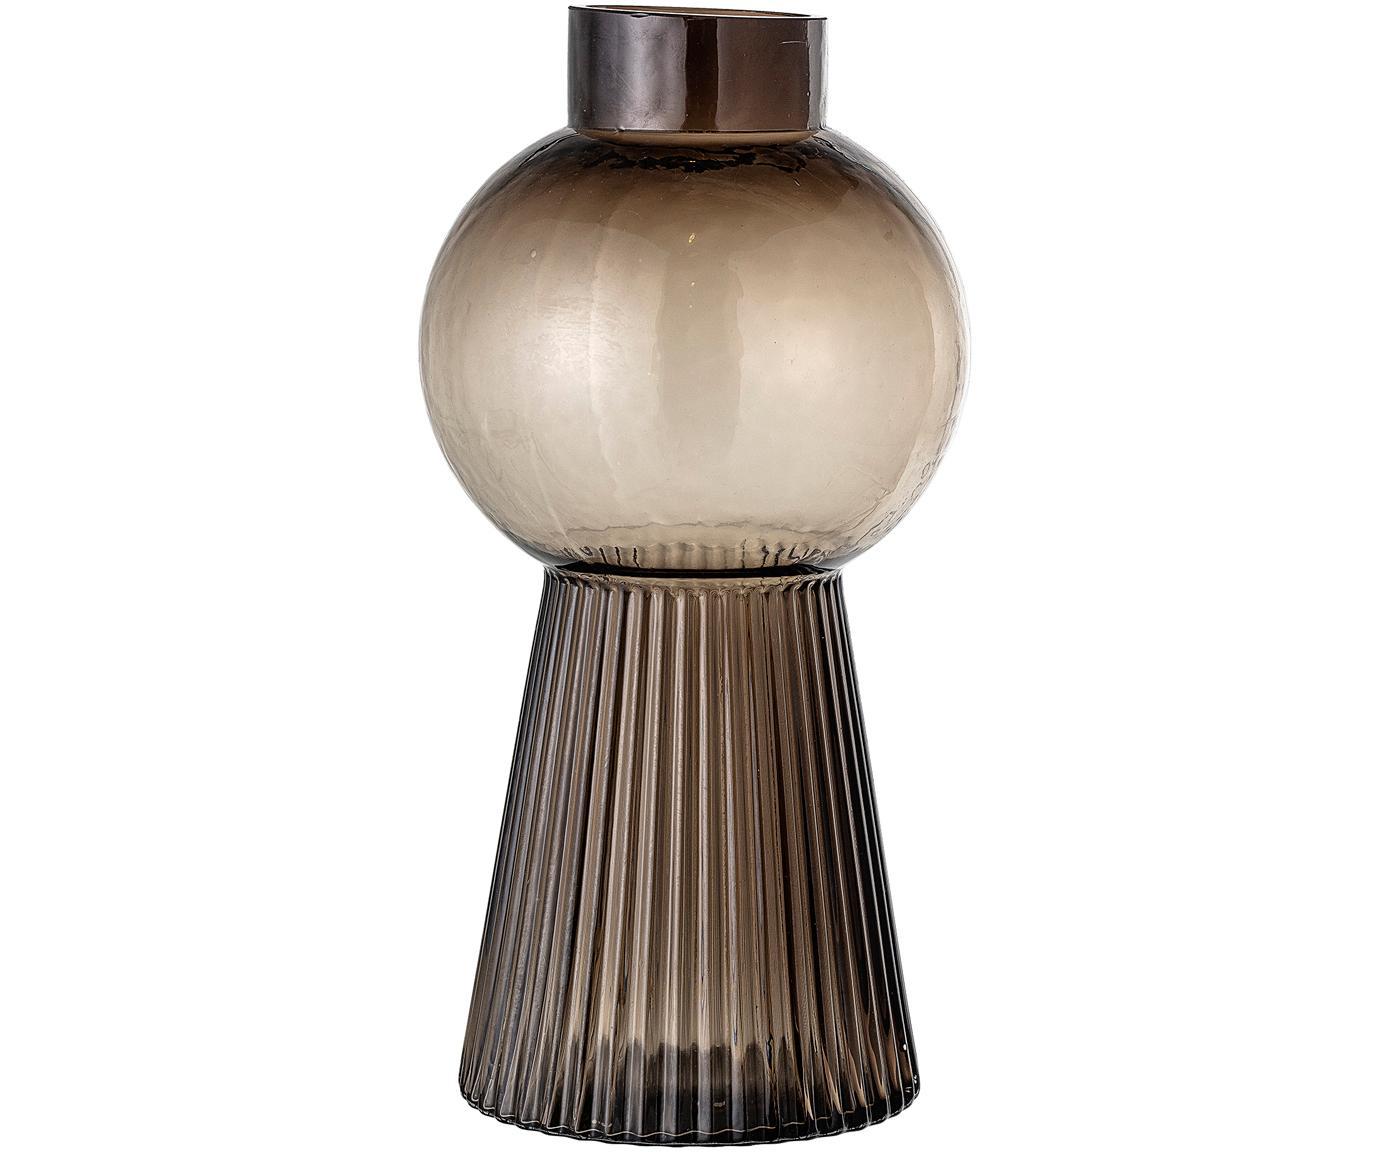 Vaas Mola, Glas, Bruin, transparant, Ø 17 x H 34 cm